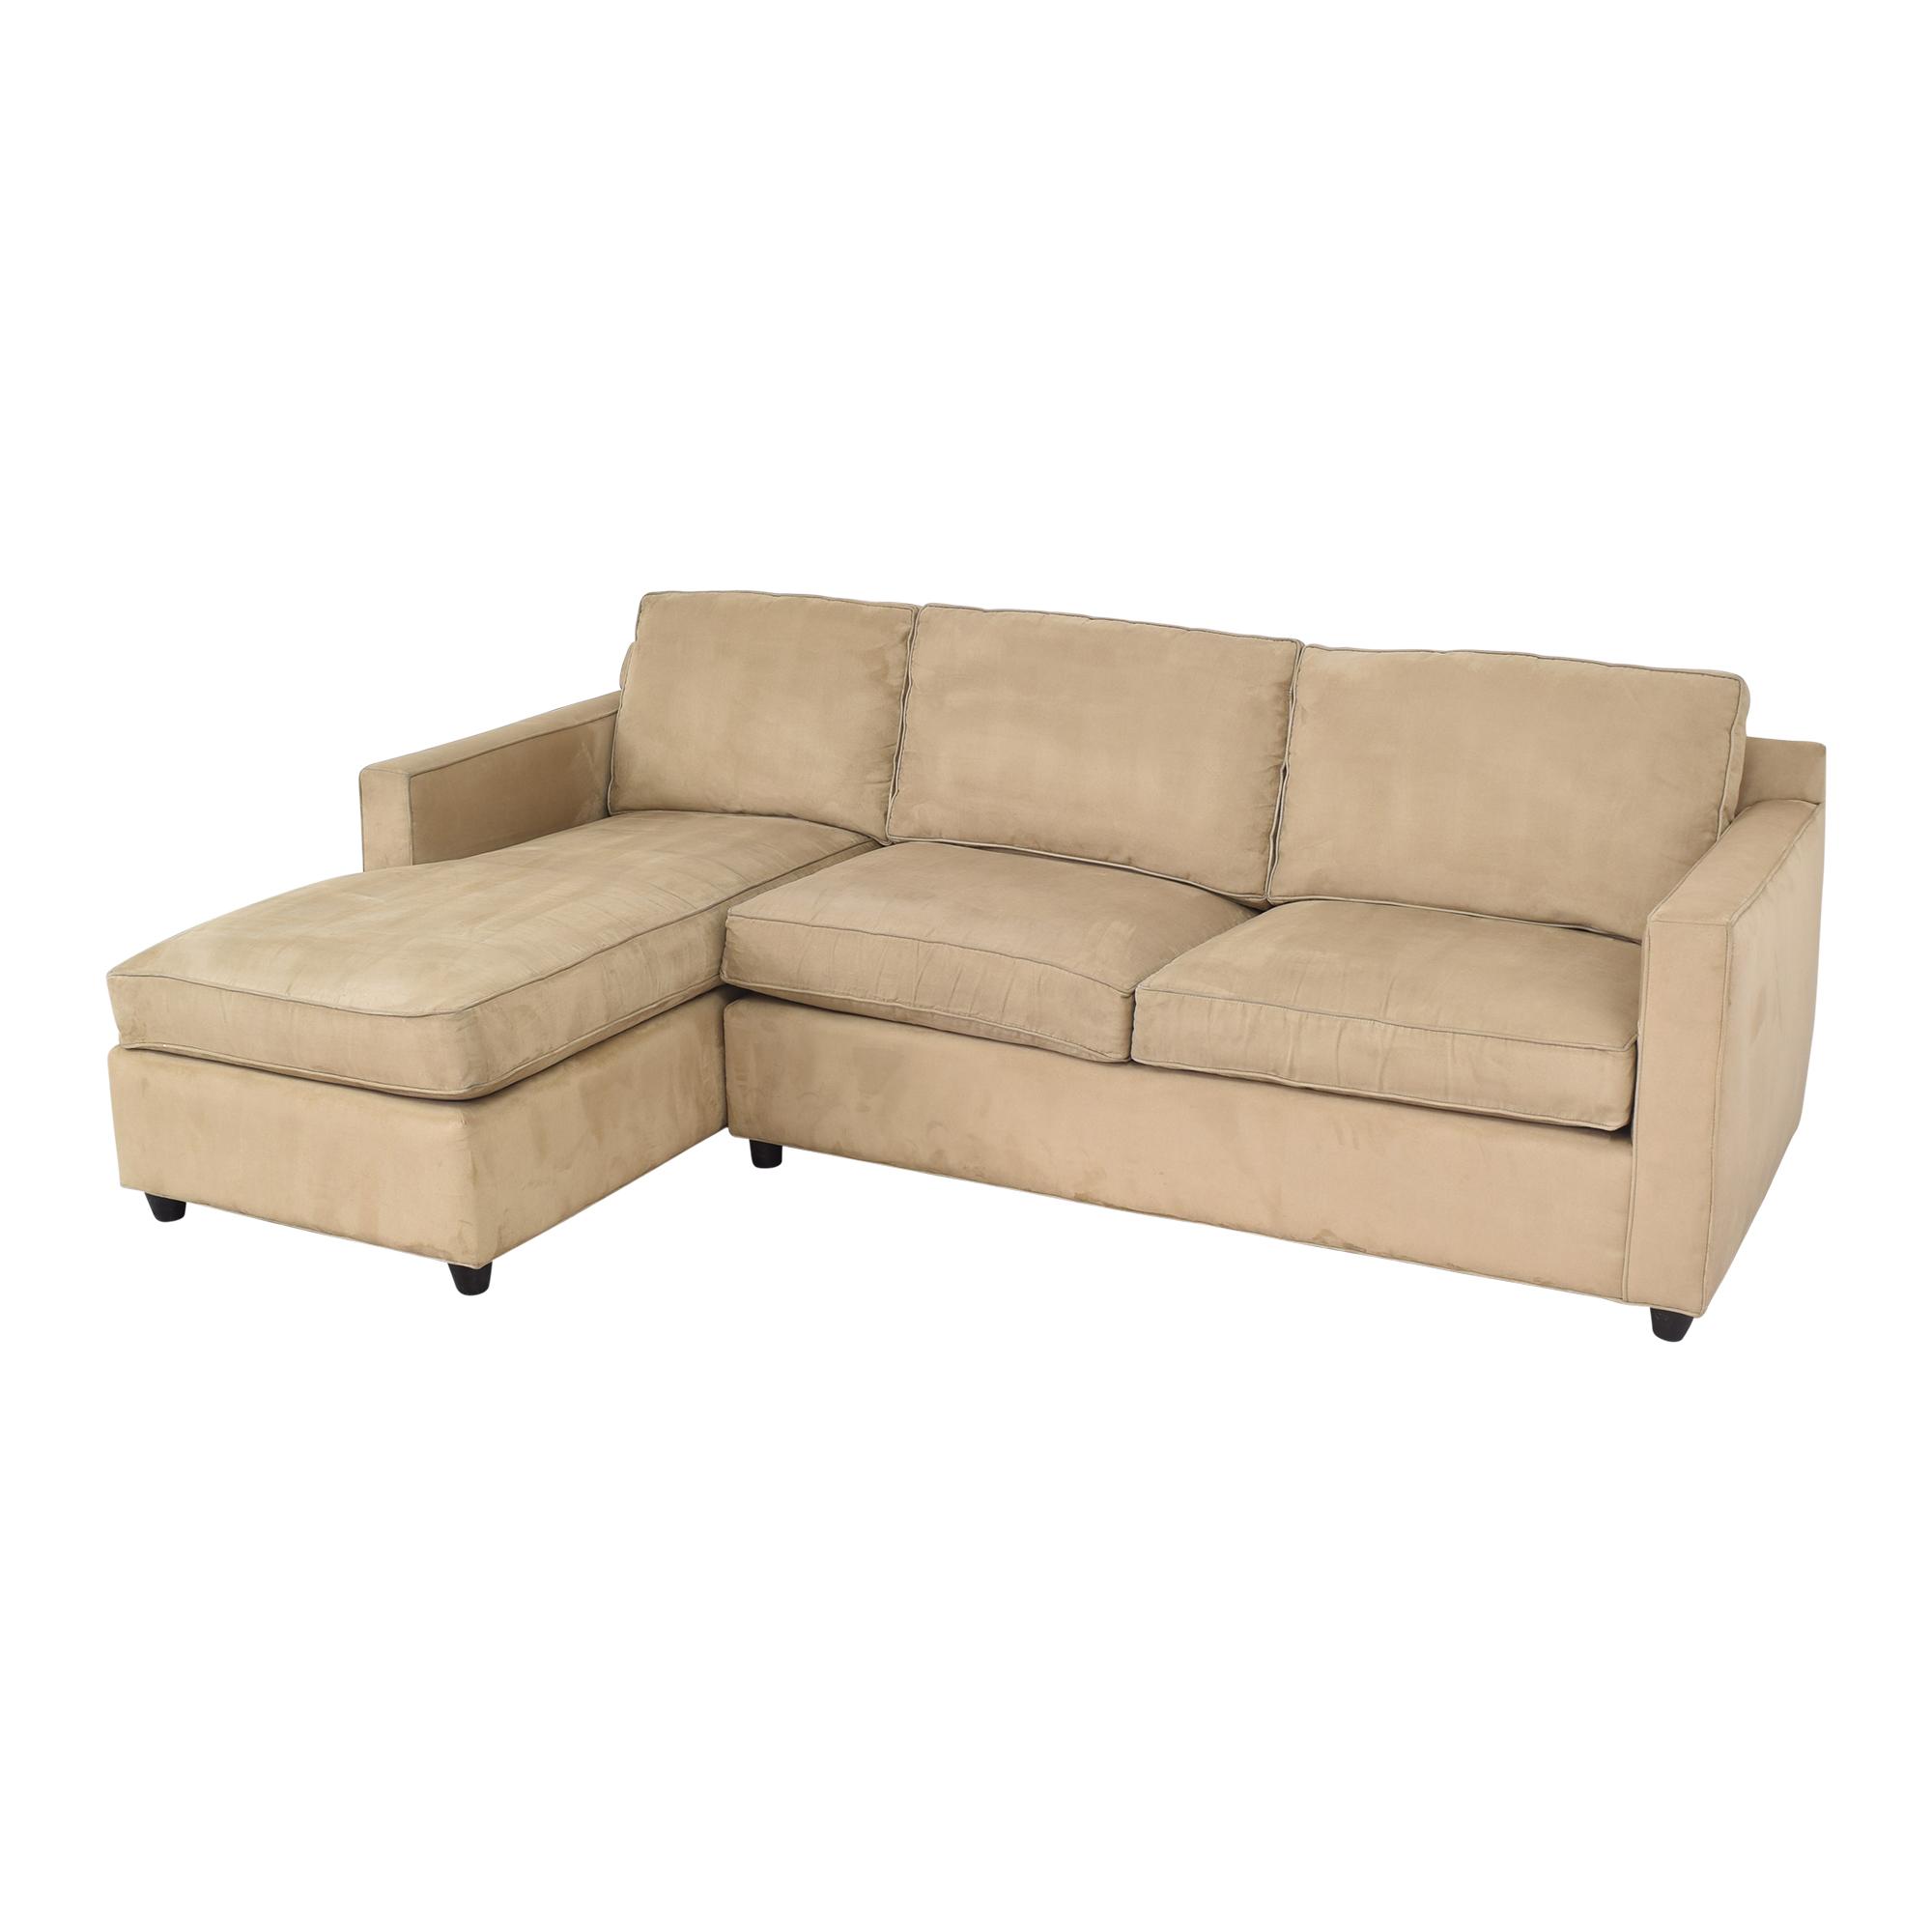 Crate & Barrel Crate & Barrel Barrett Chaise Sectional Sofa Sofas